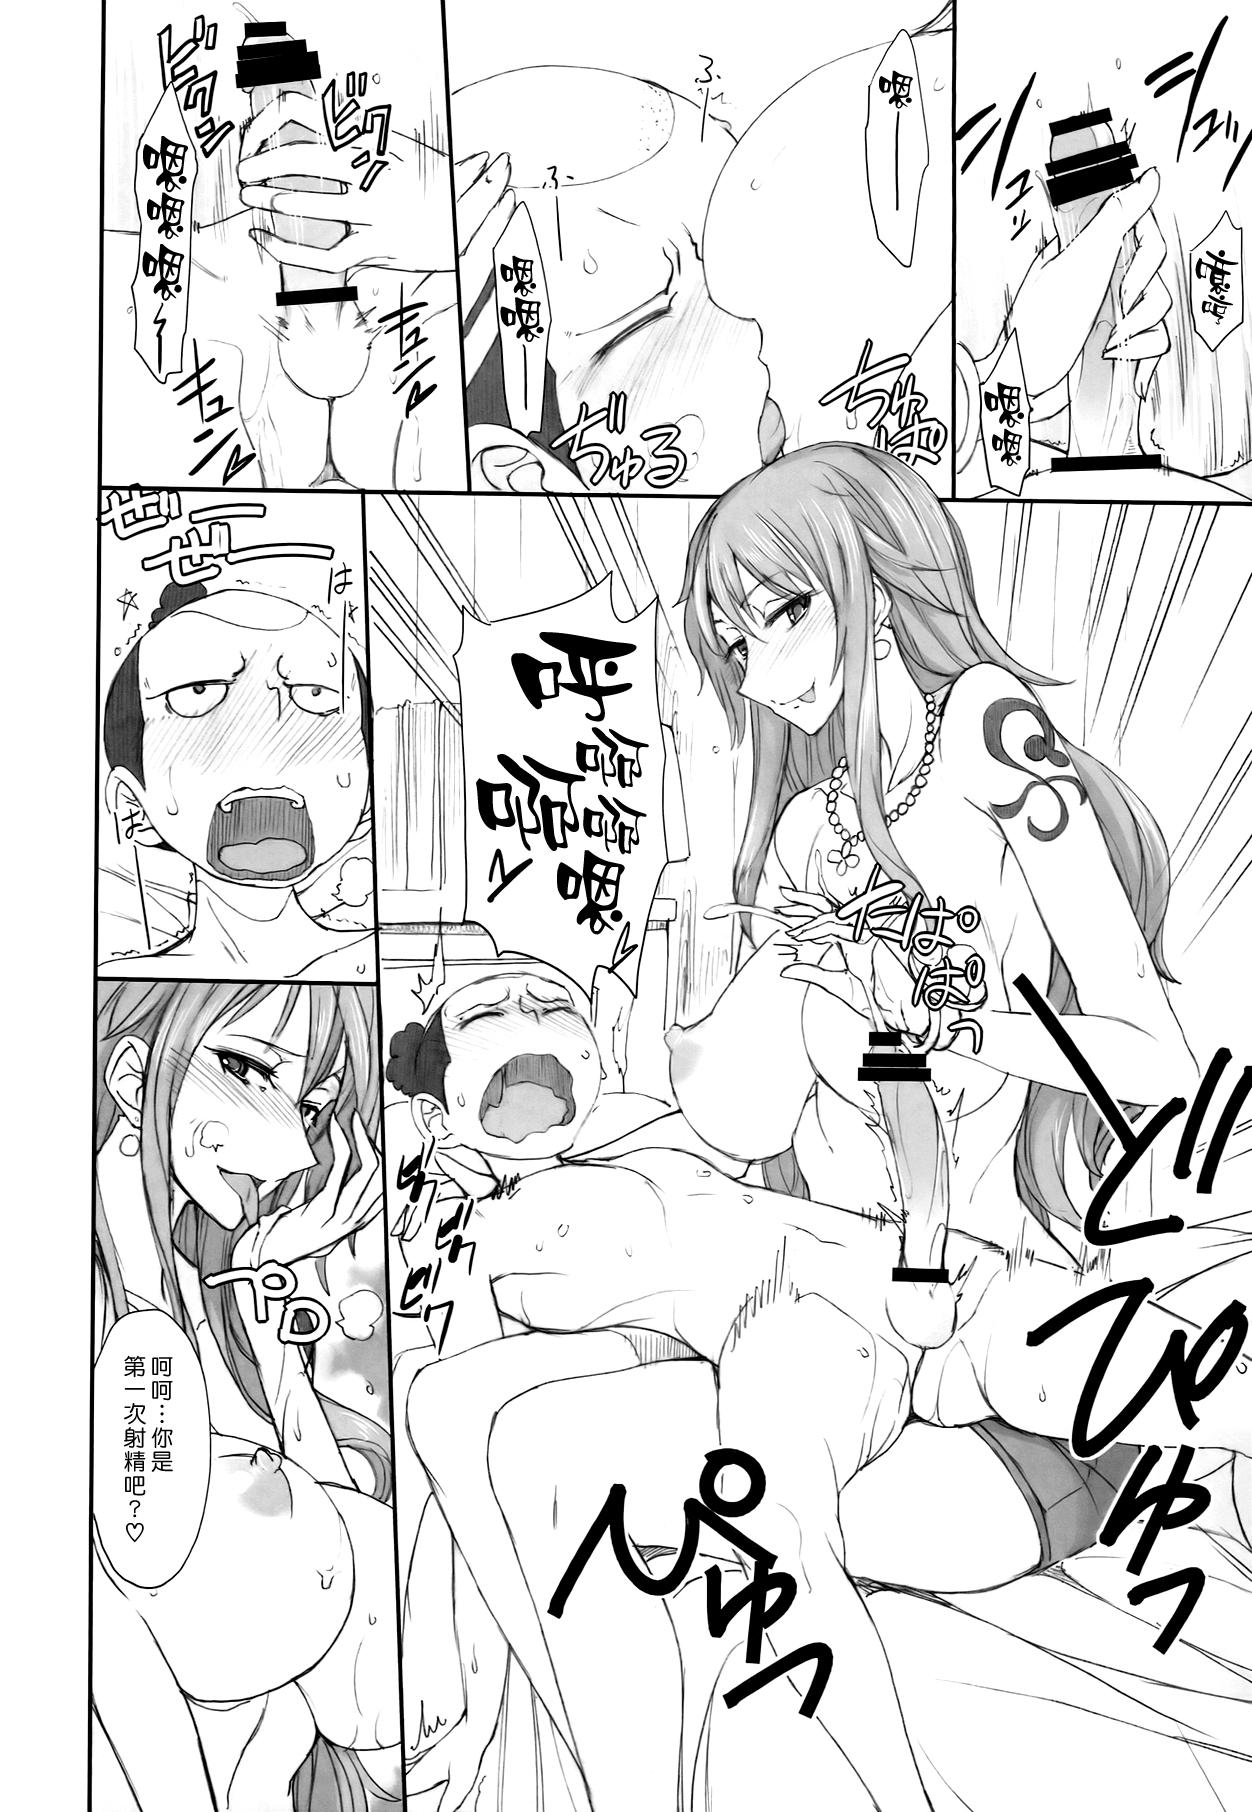 Grandline Chronicle 3 Momo ☆ Momo 9